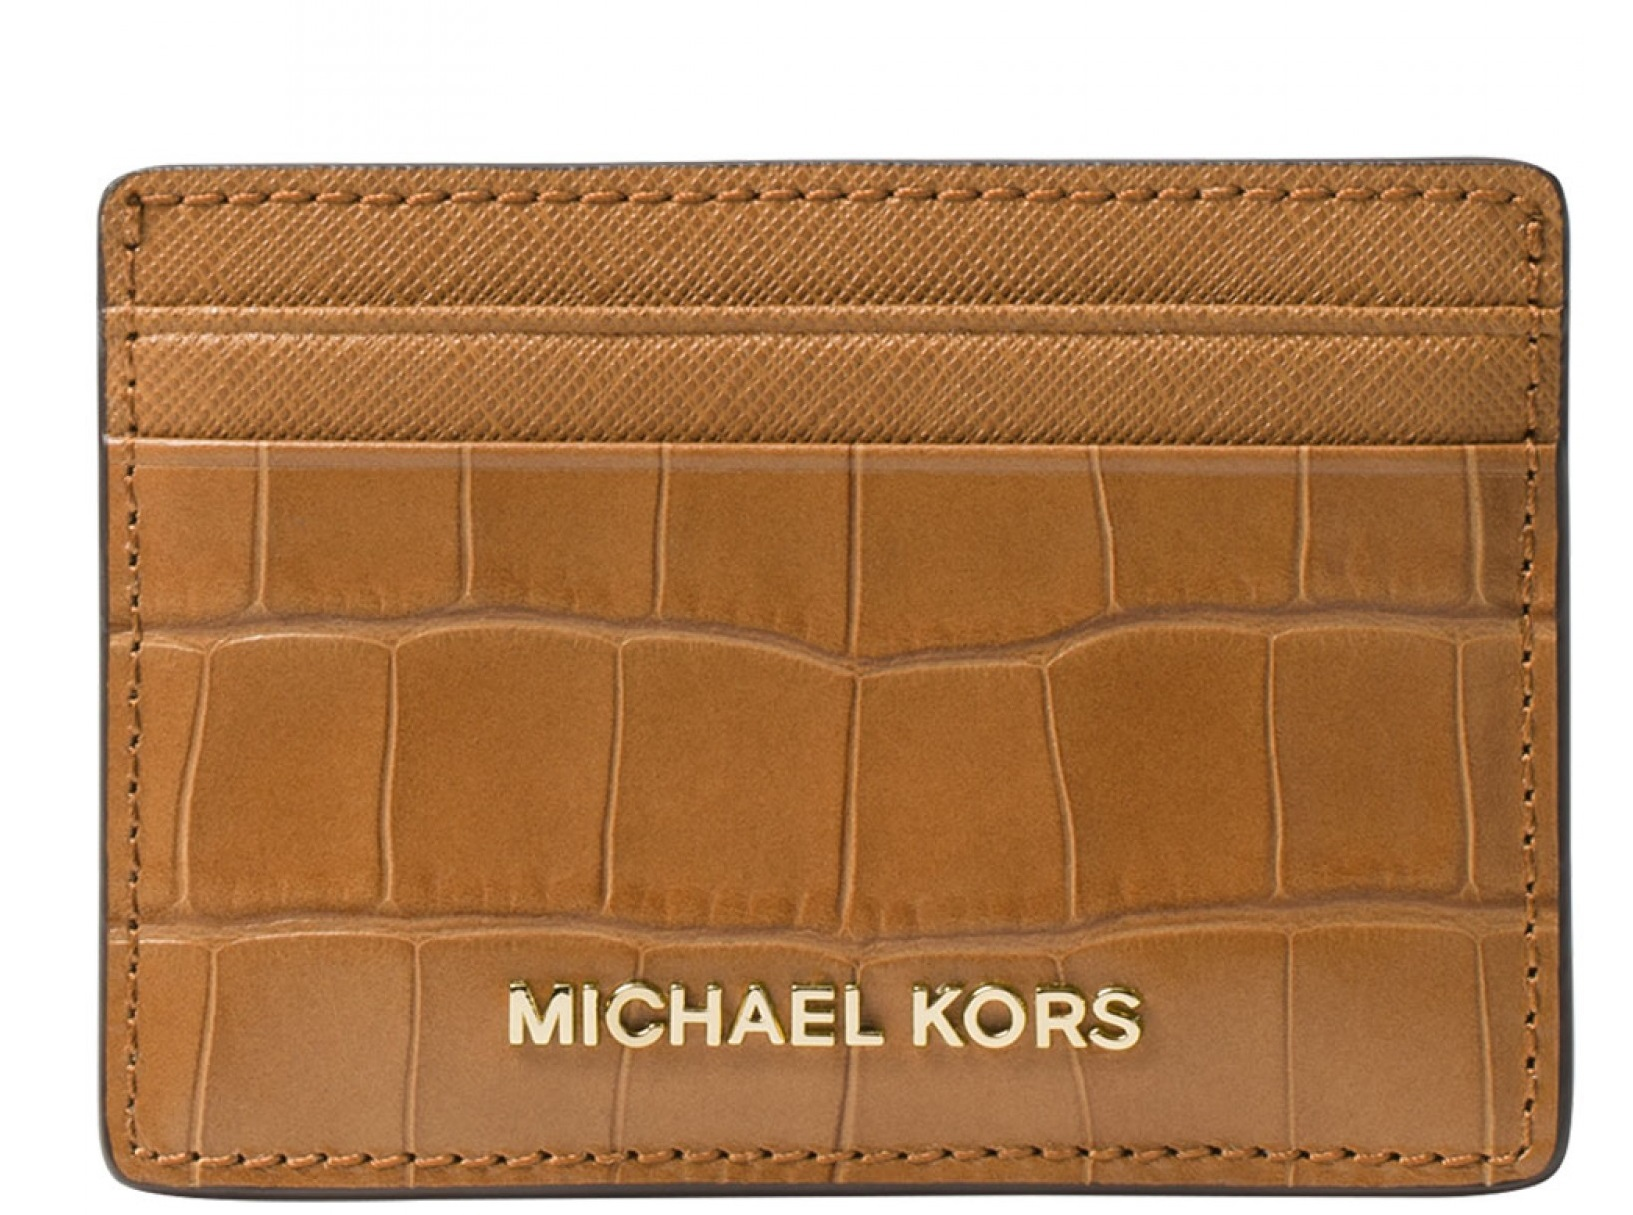 392c74e029b8 Michael Kors Money Pieces Crocodile-effect Leather - Card Holder - Acorn -  32F7GF6D0E-